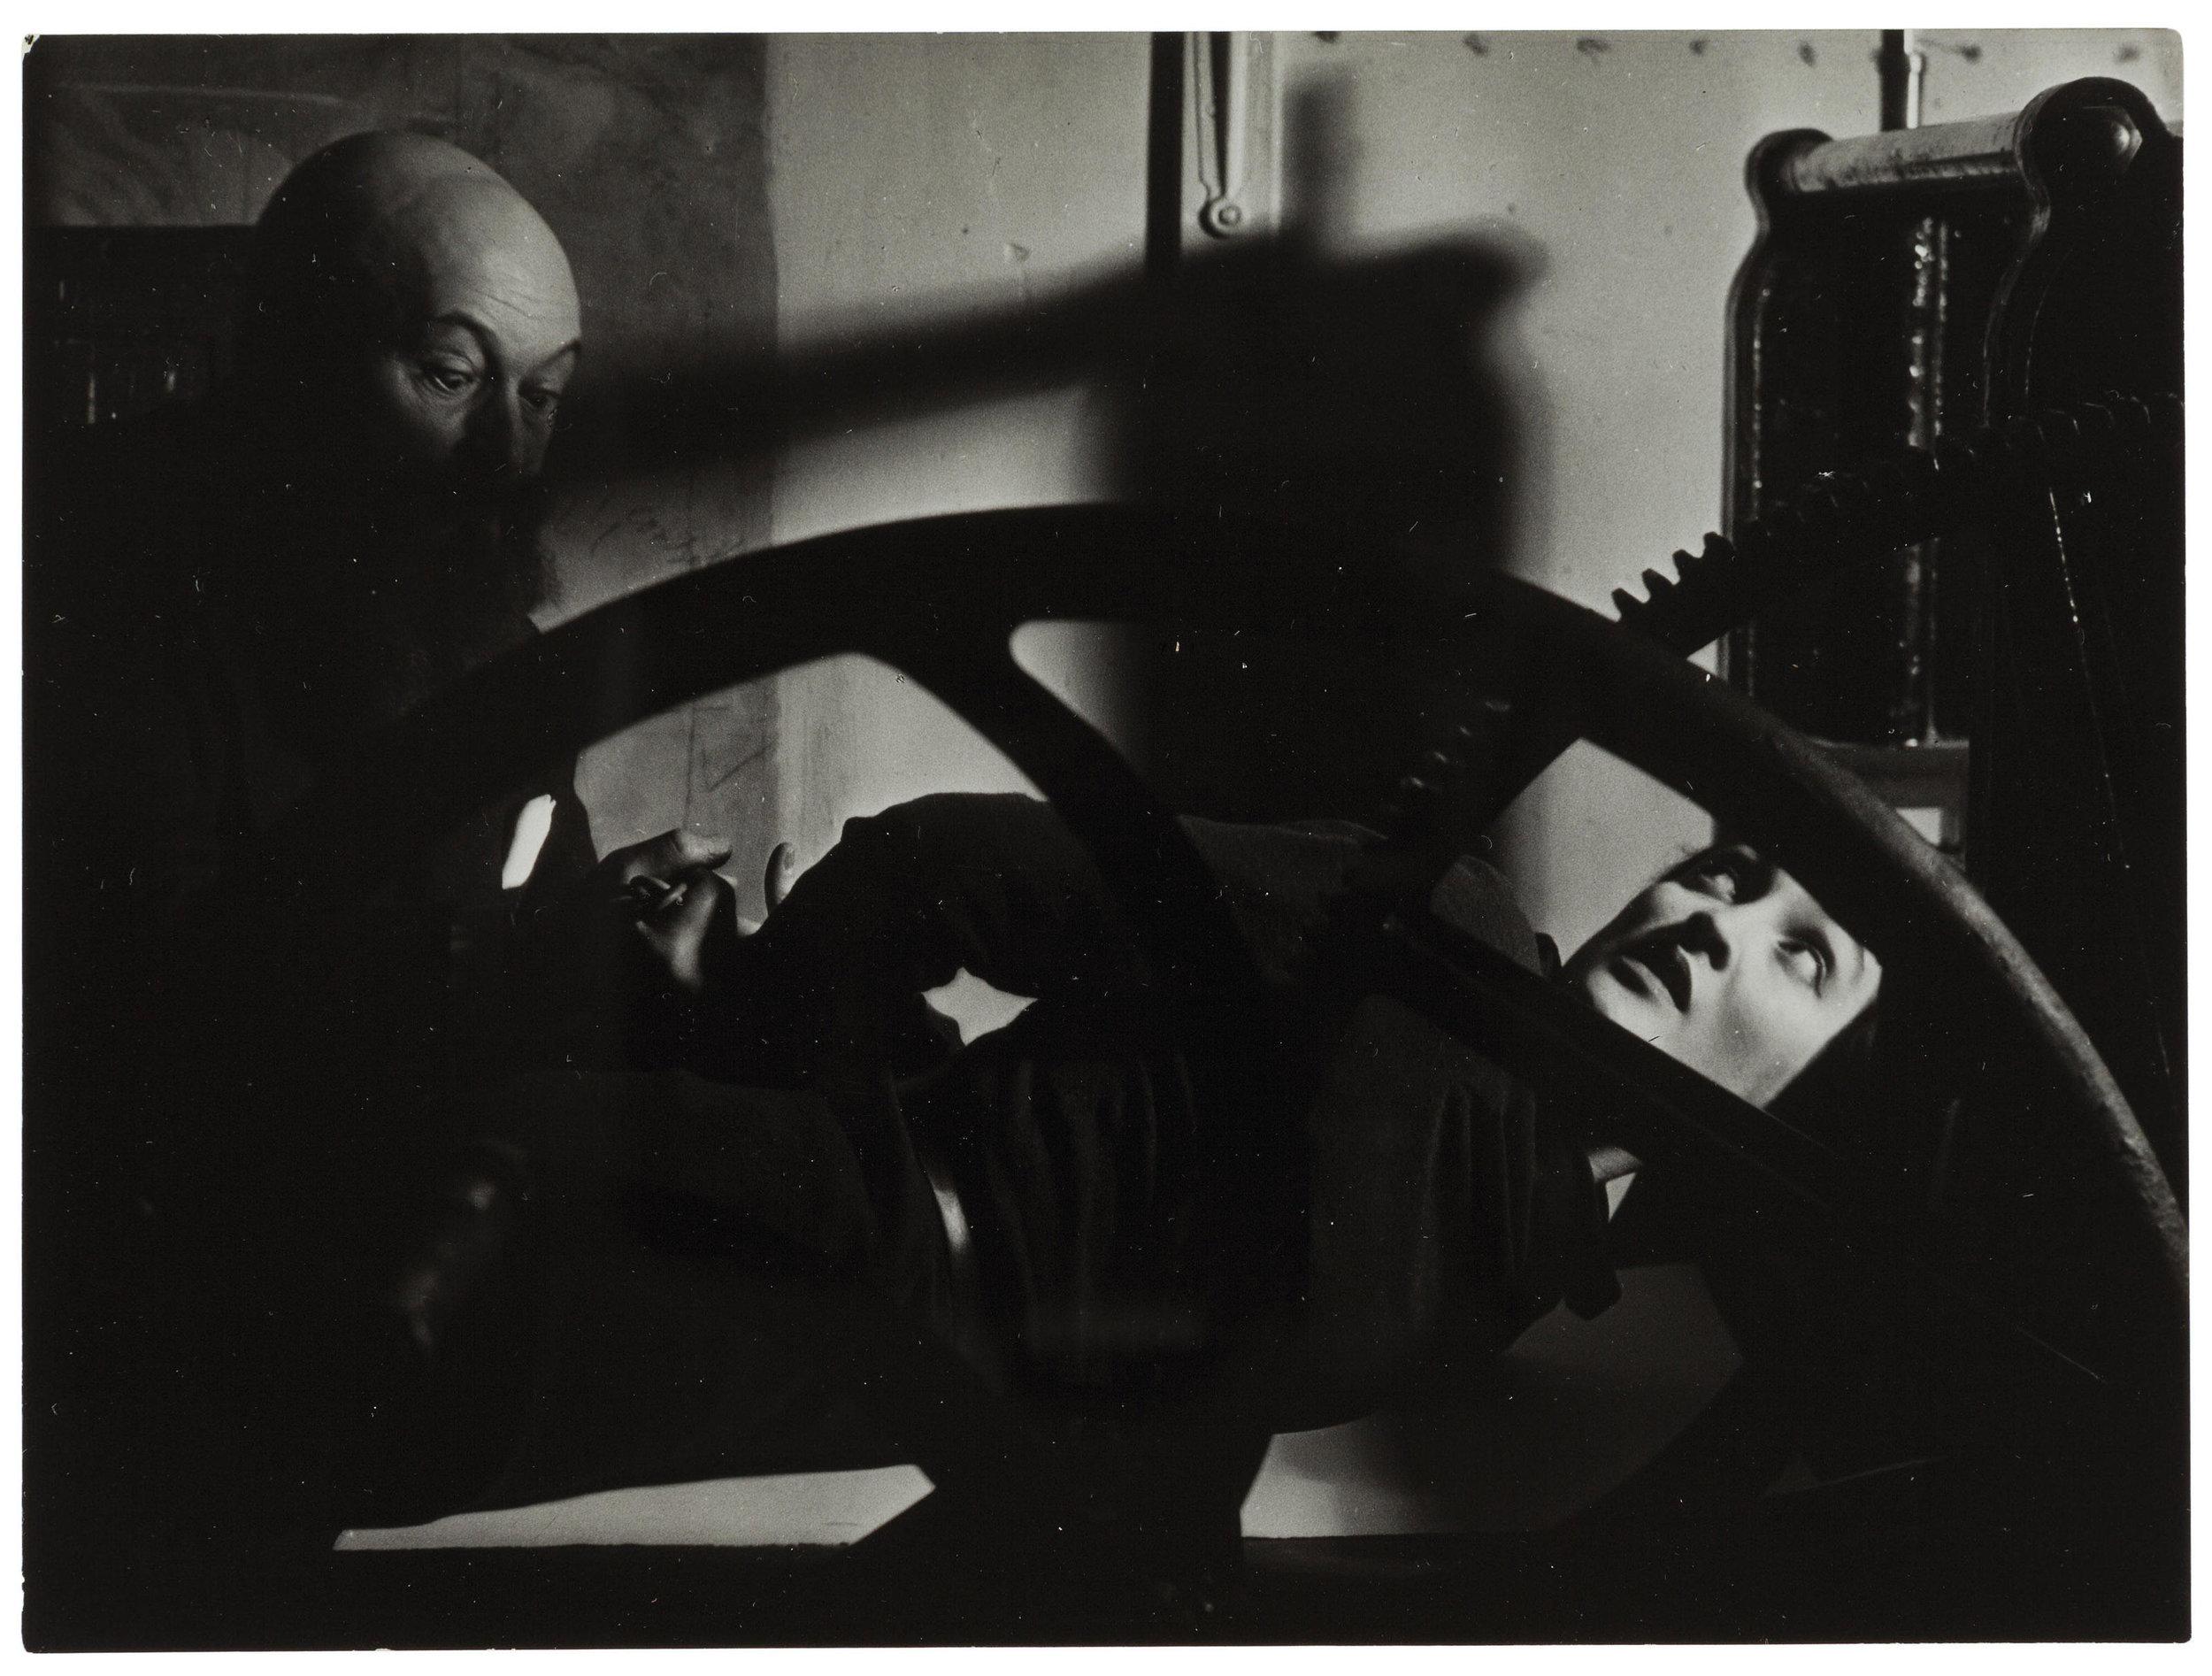 Man Ray,Méret Oppenheim, Louis Marcoussis, 1933